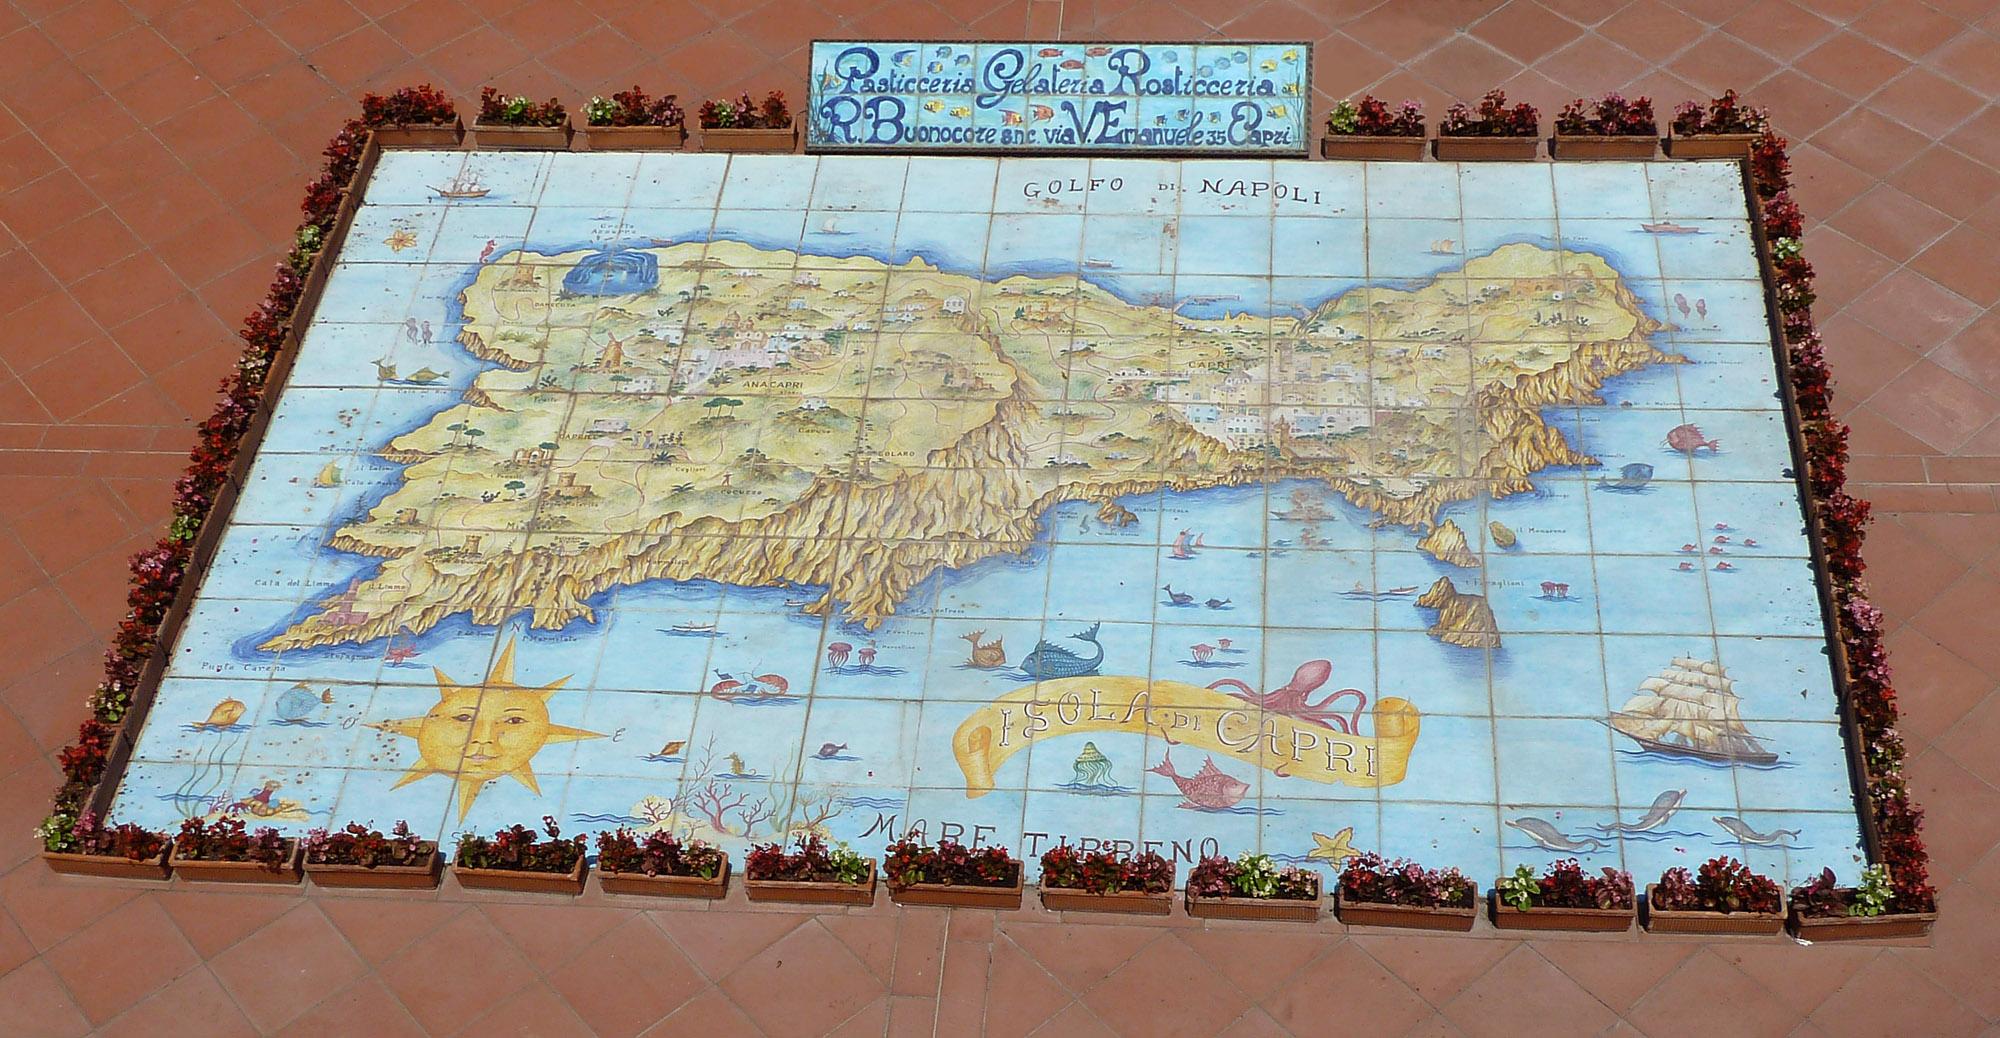 Tile Map Of Isle Of Capri Italy